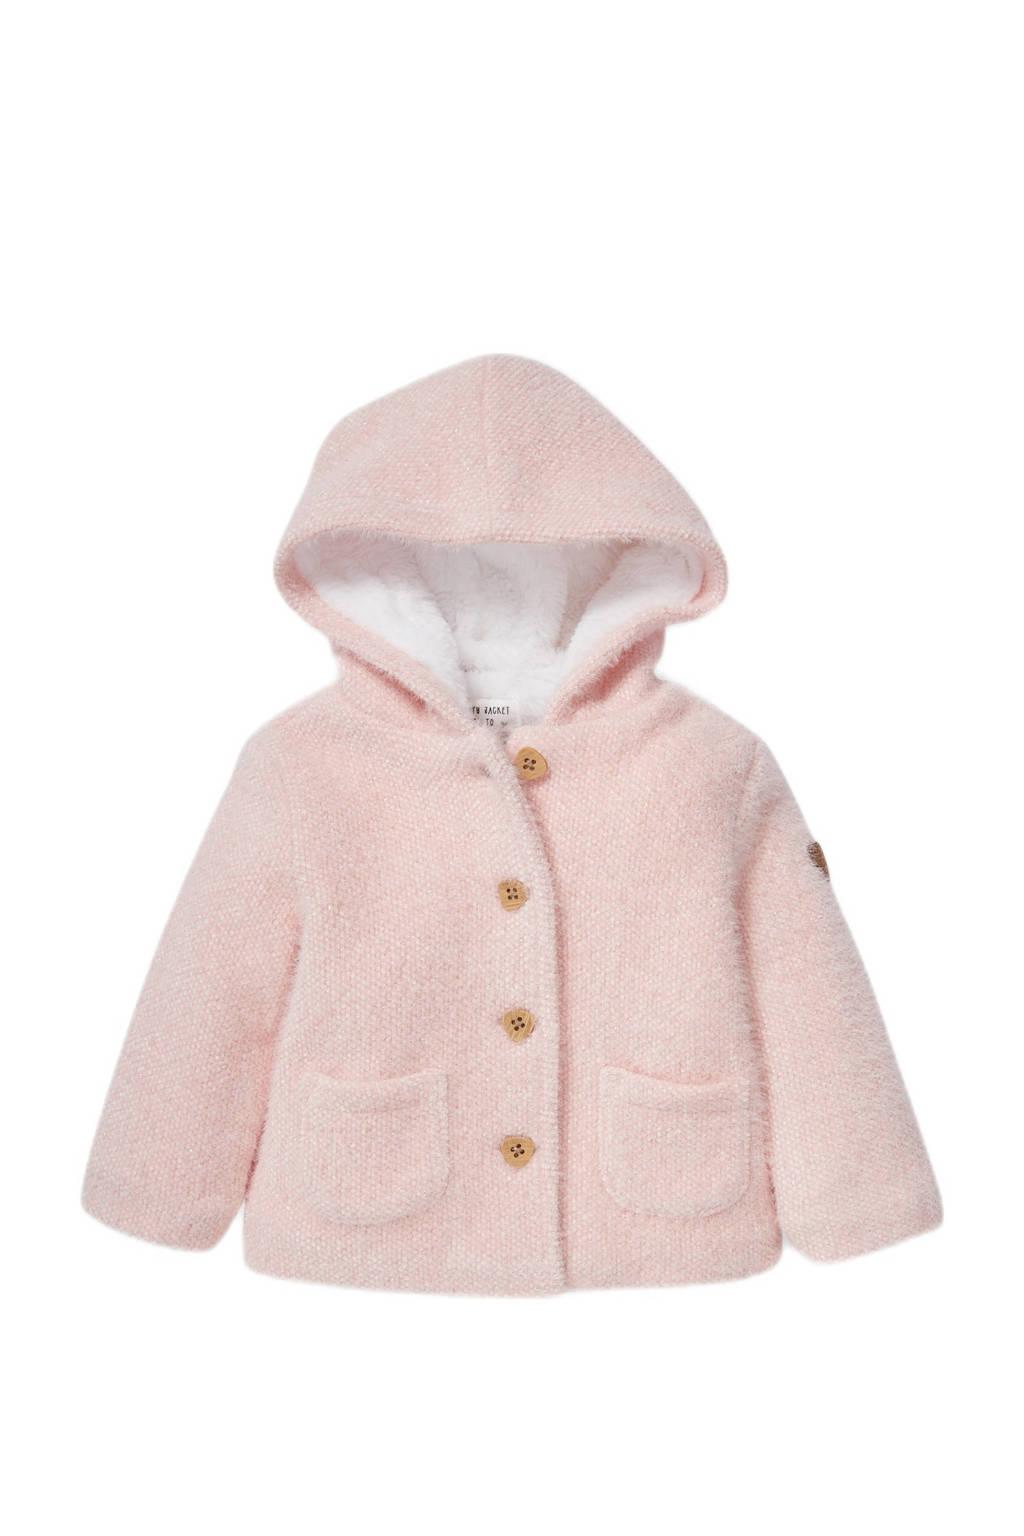 C&A Baby Club baby winterjas lichtroze, Lichtroze